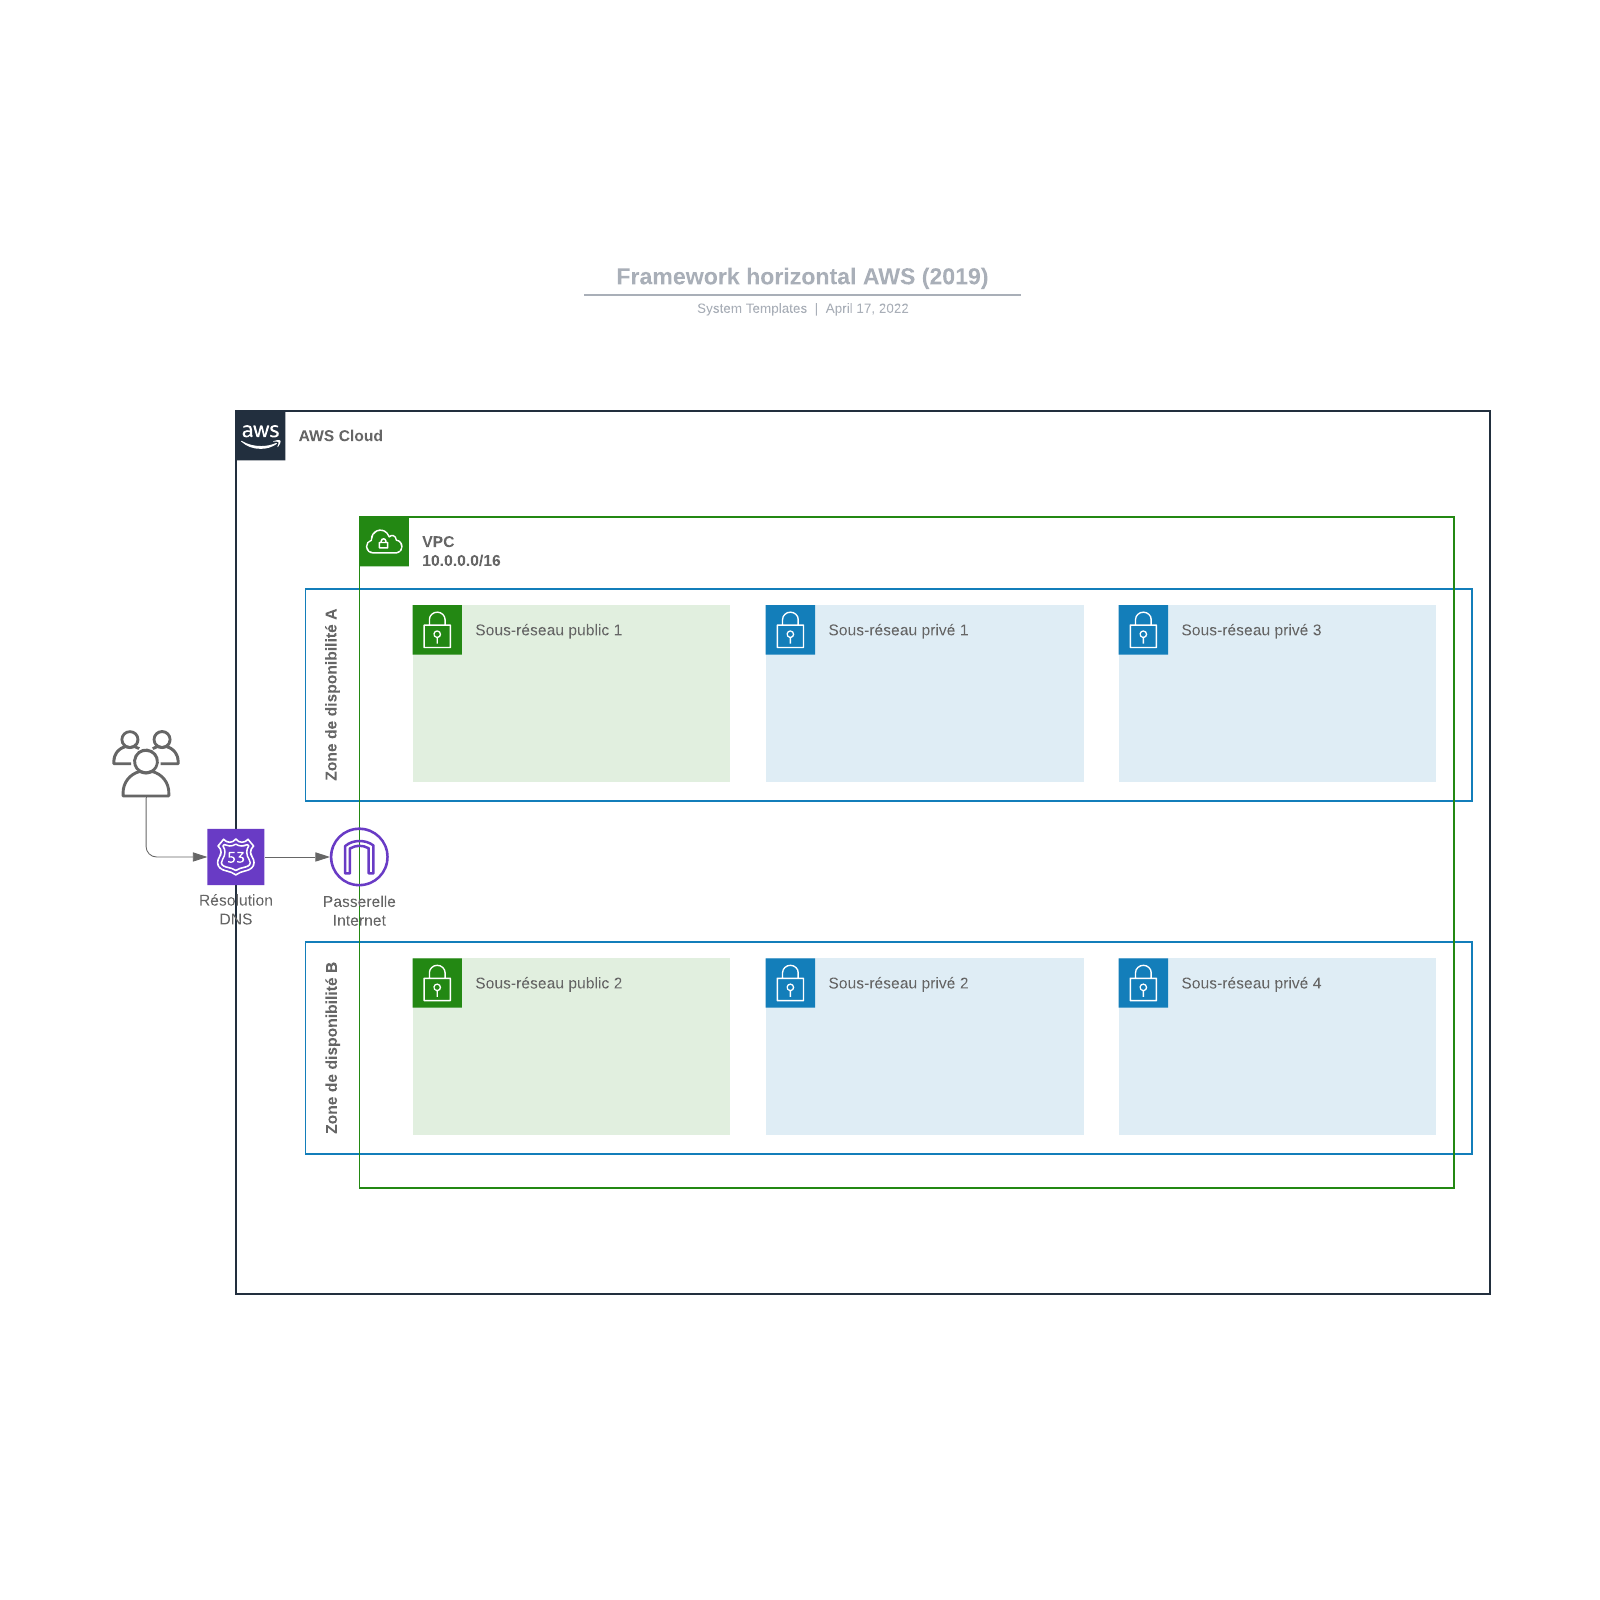 exemple de framework horizontal AWS (2019)